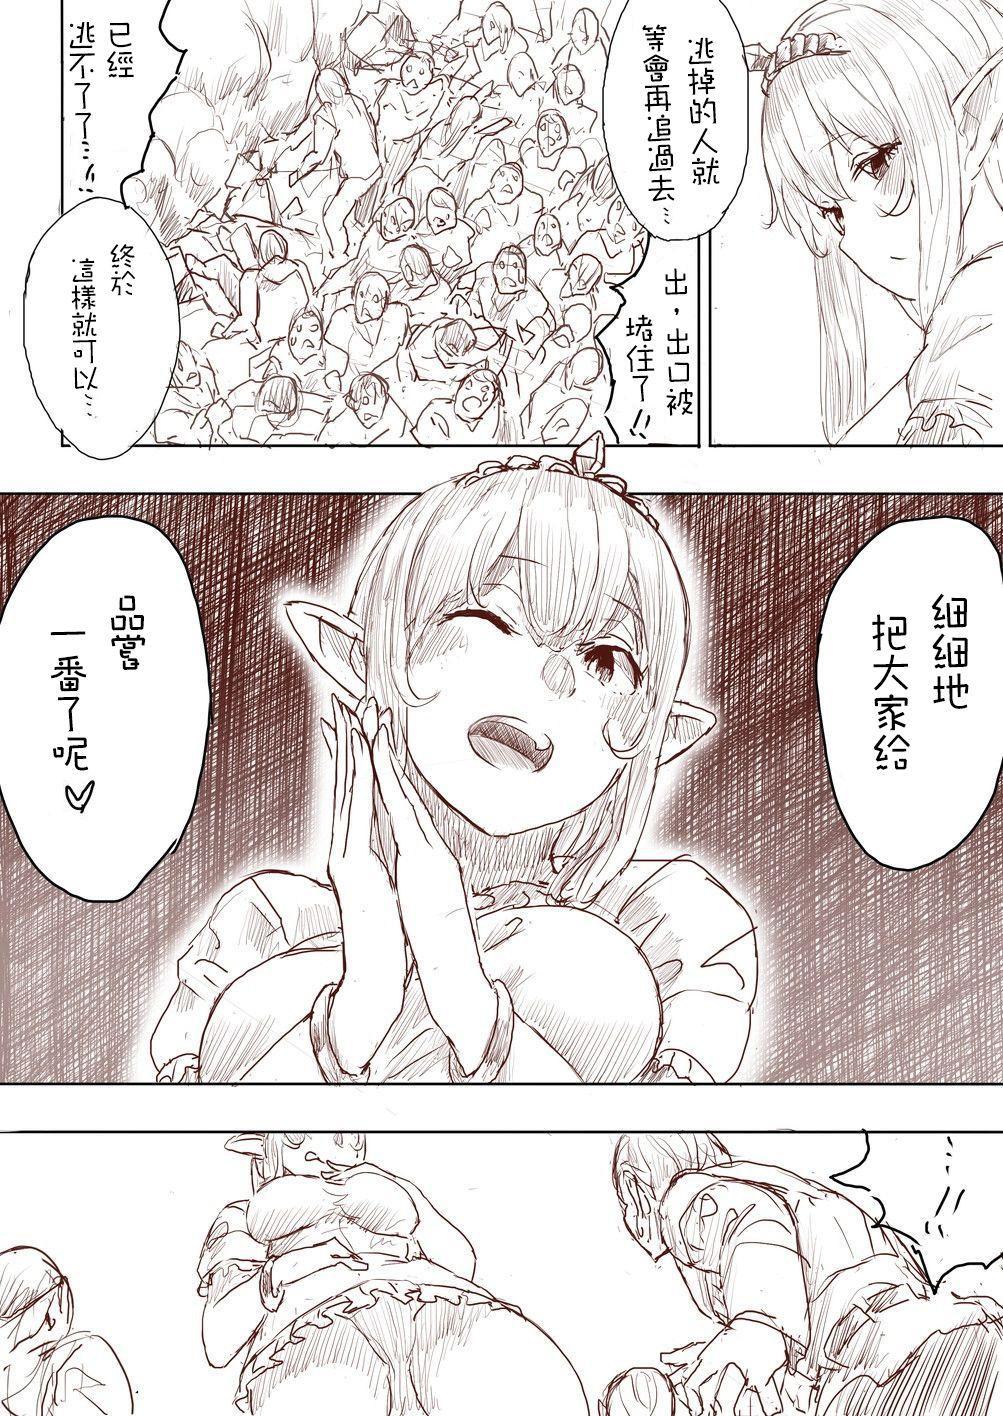 Elf Princess Strikes Back Part1 122